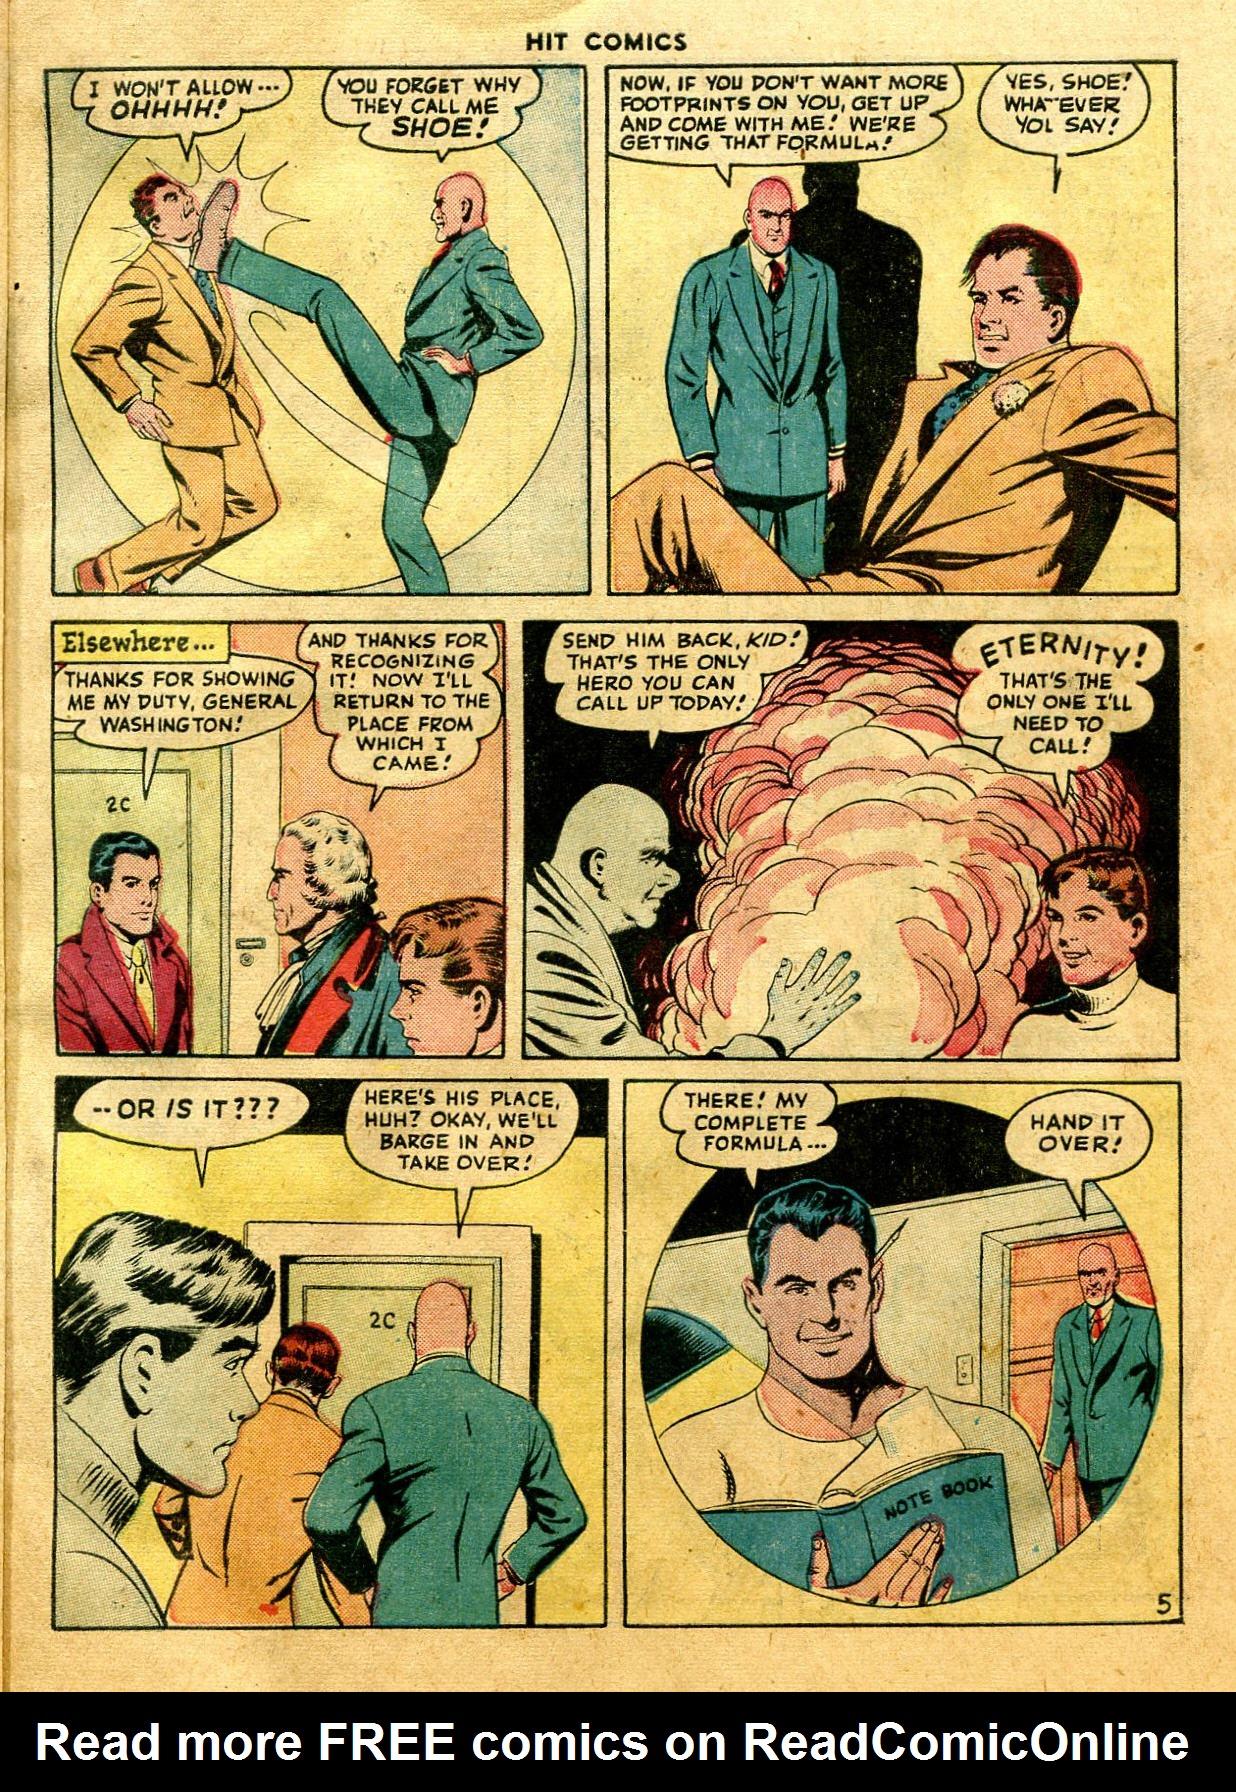 Read online Hit Comics comic -  Issue #44 - 7